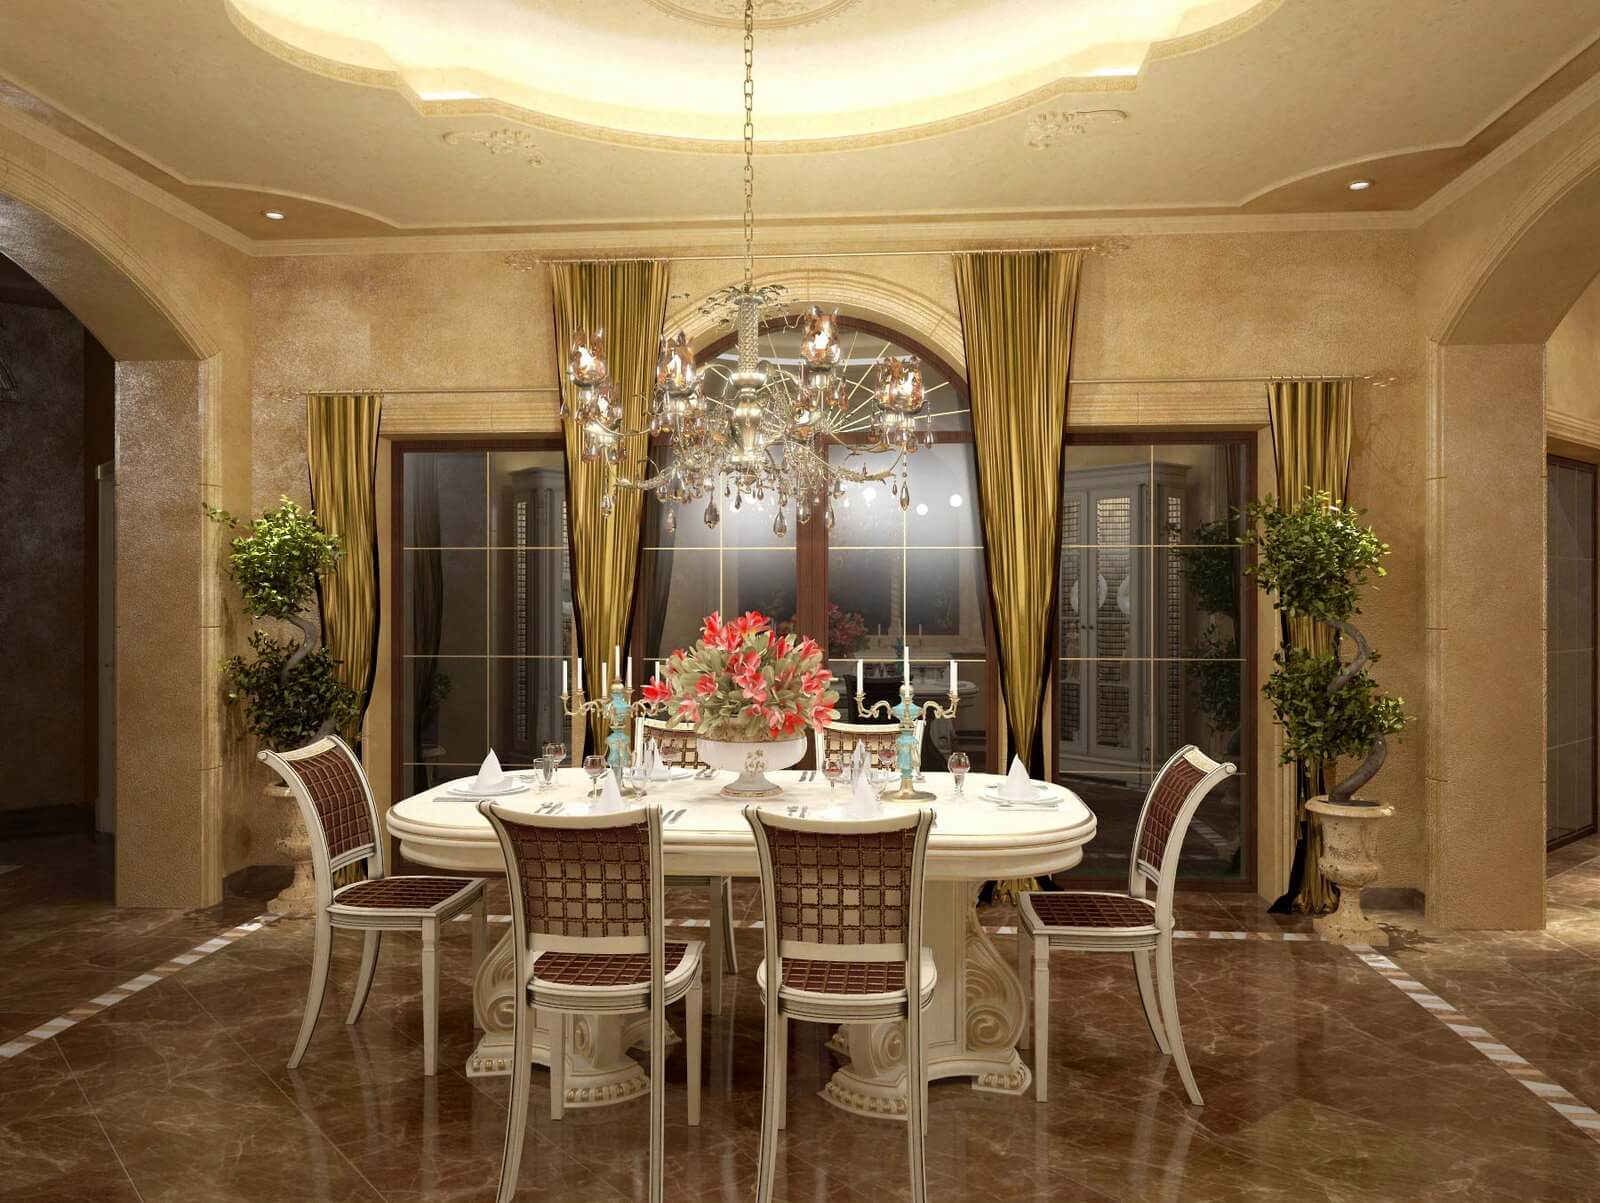 Classic furniture 3d models kstudio 3ds max plugins for Dining room 3d max interior scenes